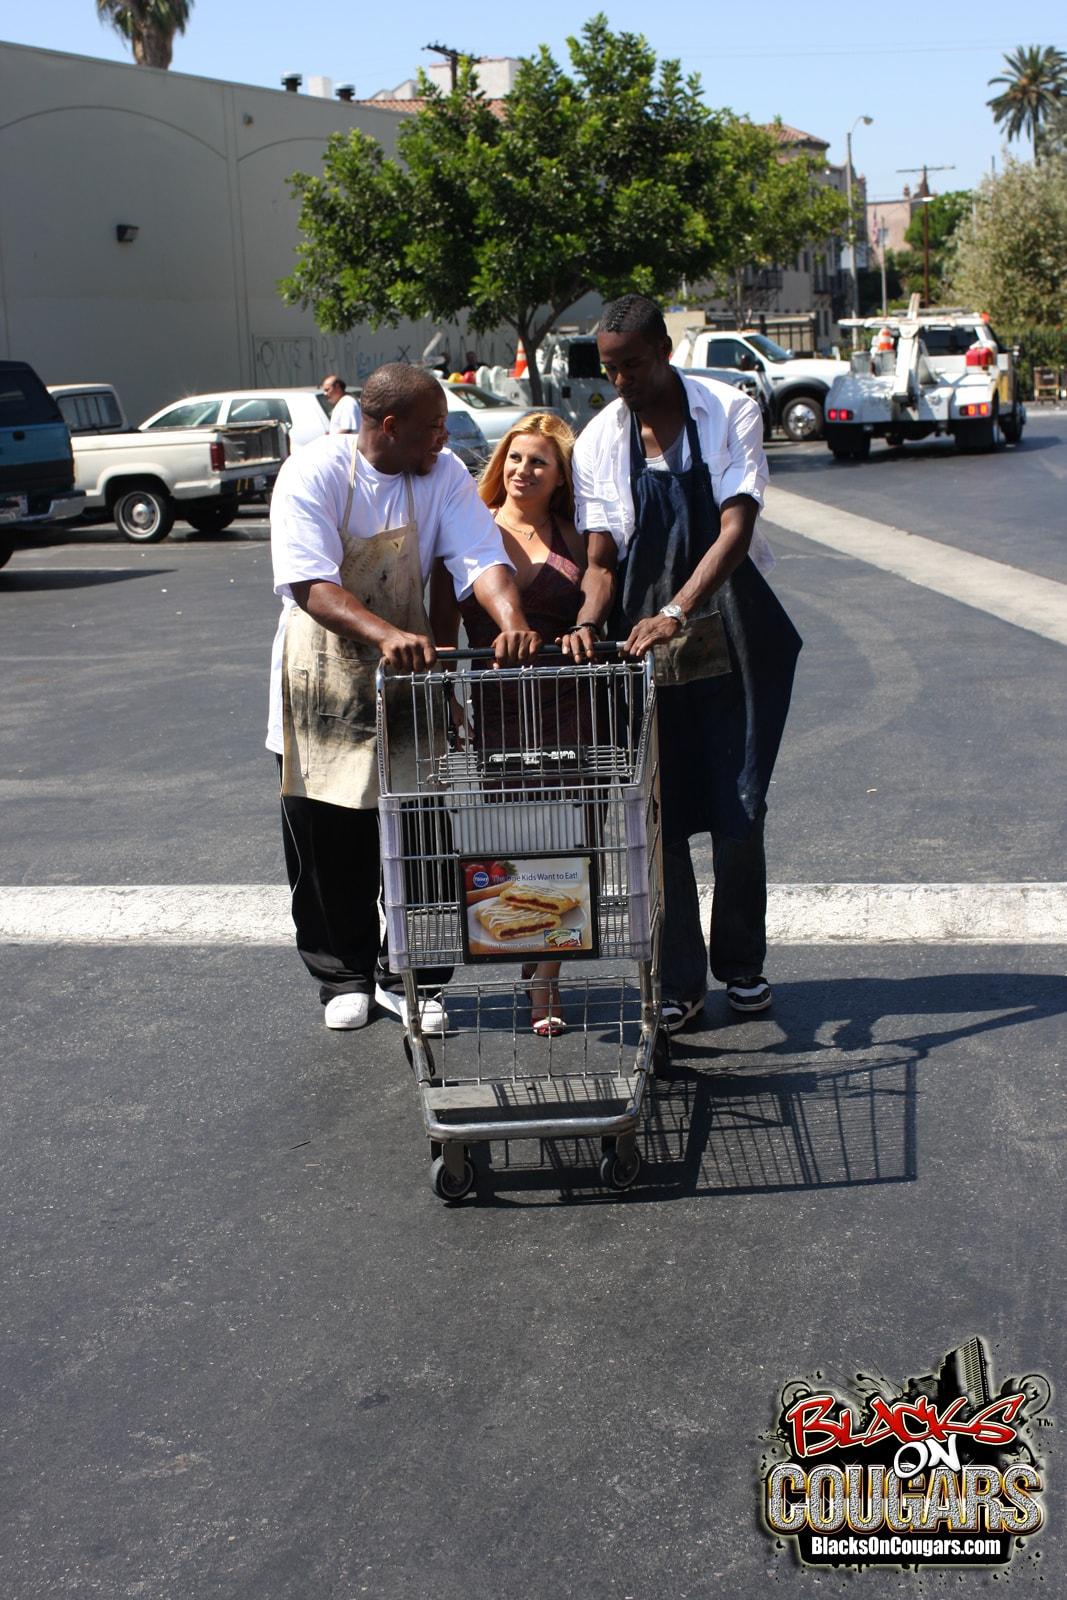 Dogfart '- Blacks On Cougars' starring Friday (Photo 1)